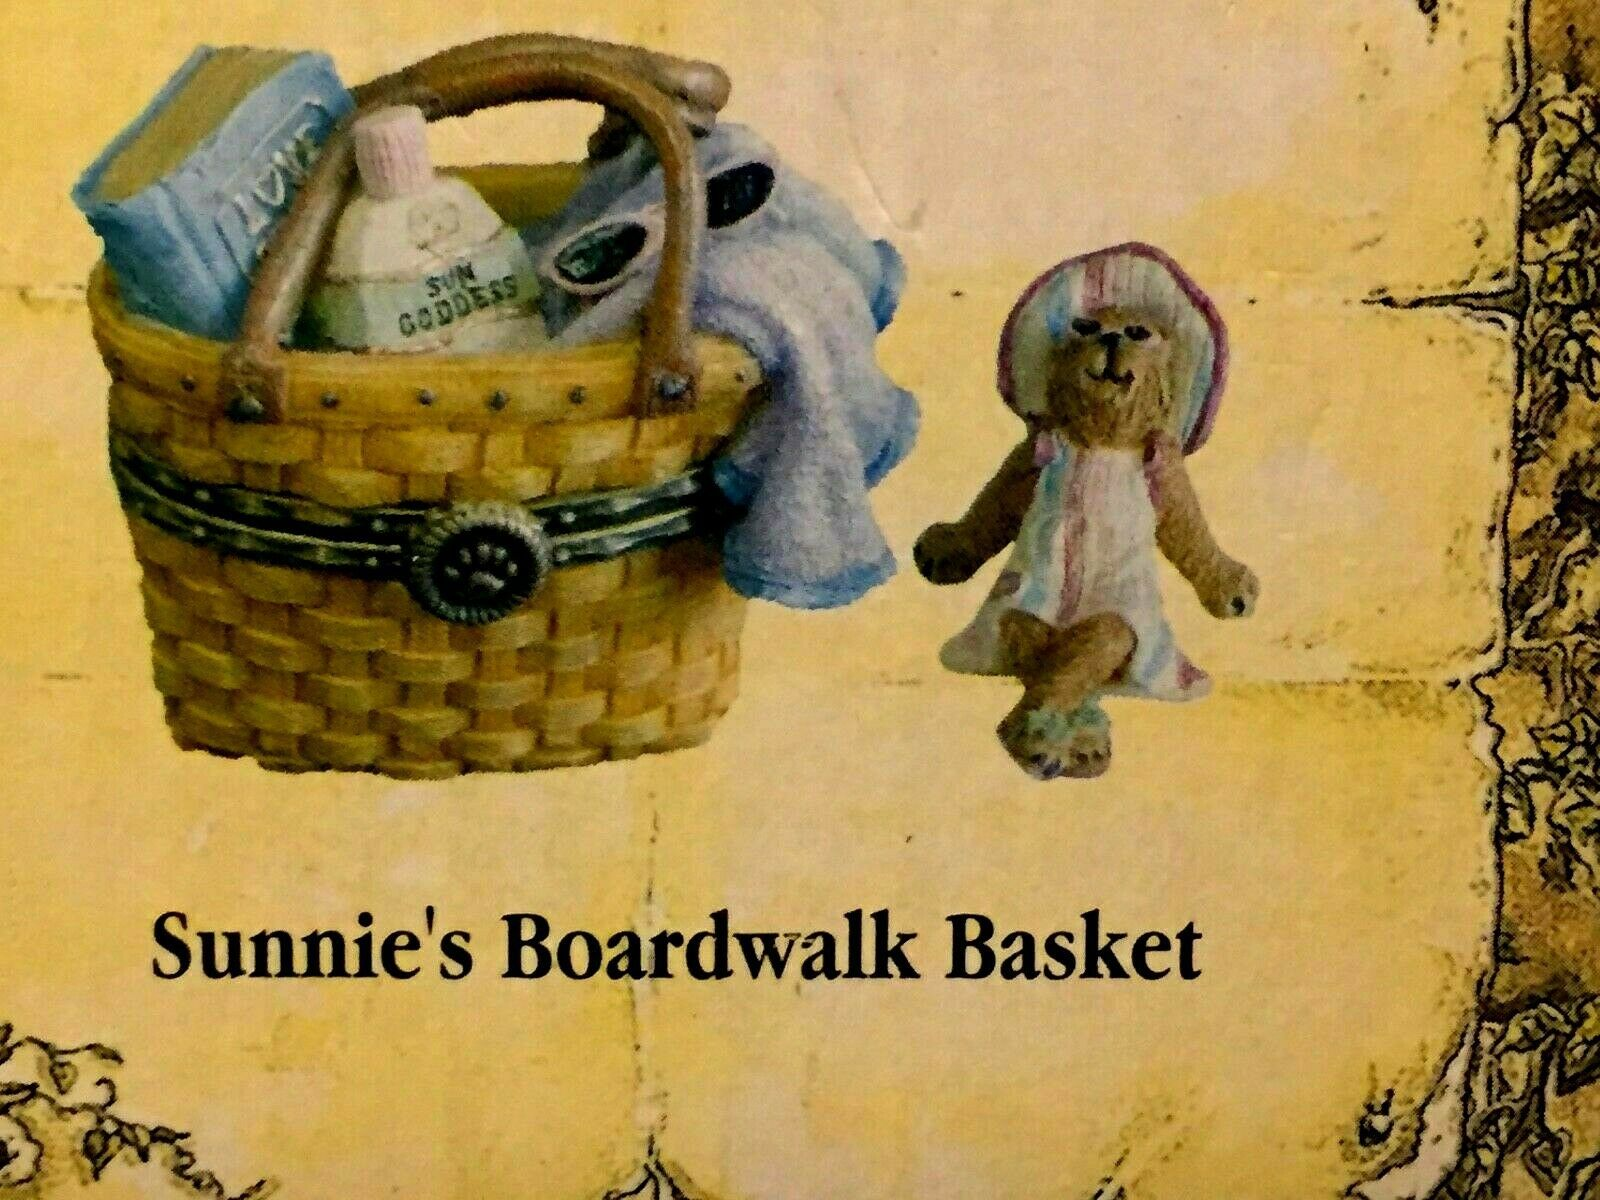 "Boyds Treasure Box ""Sunnie's Boardwalk Basket"" #392135LB-LONGABERGER LE- New"